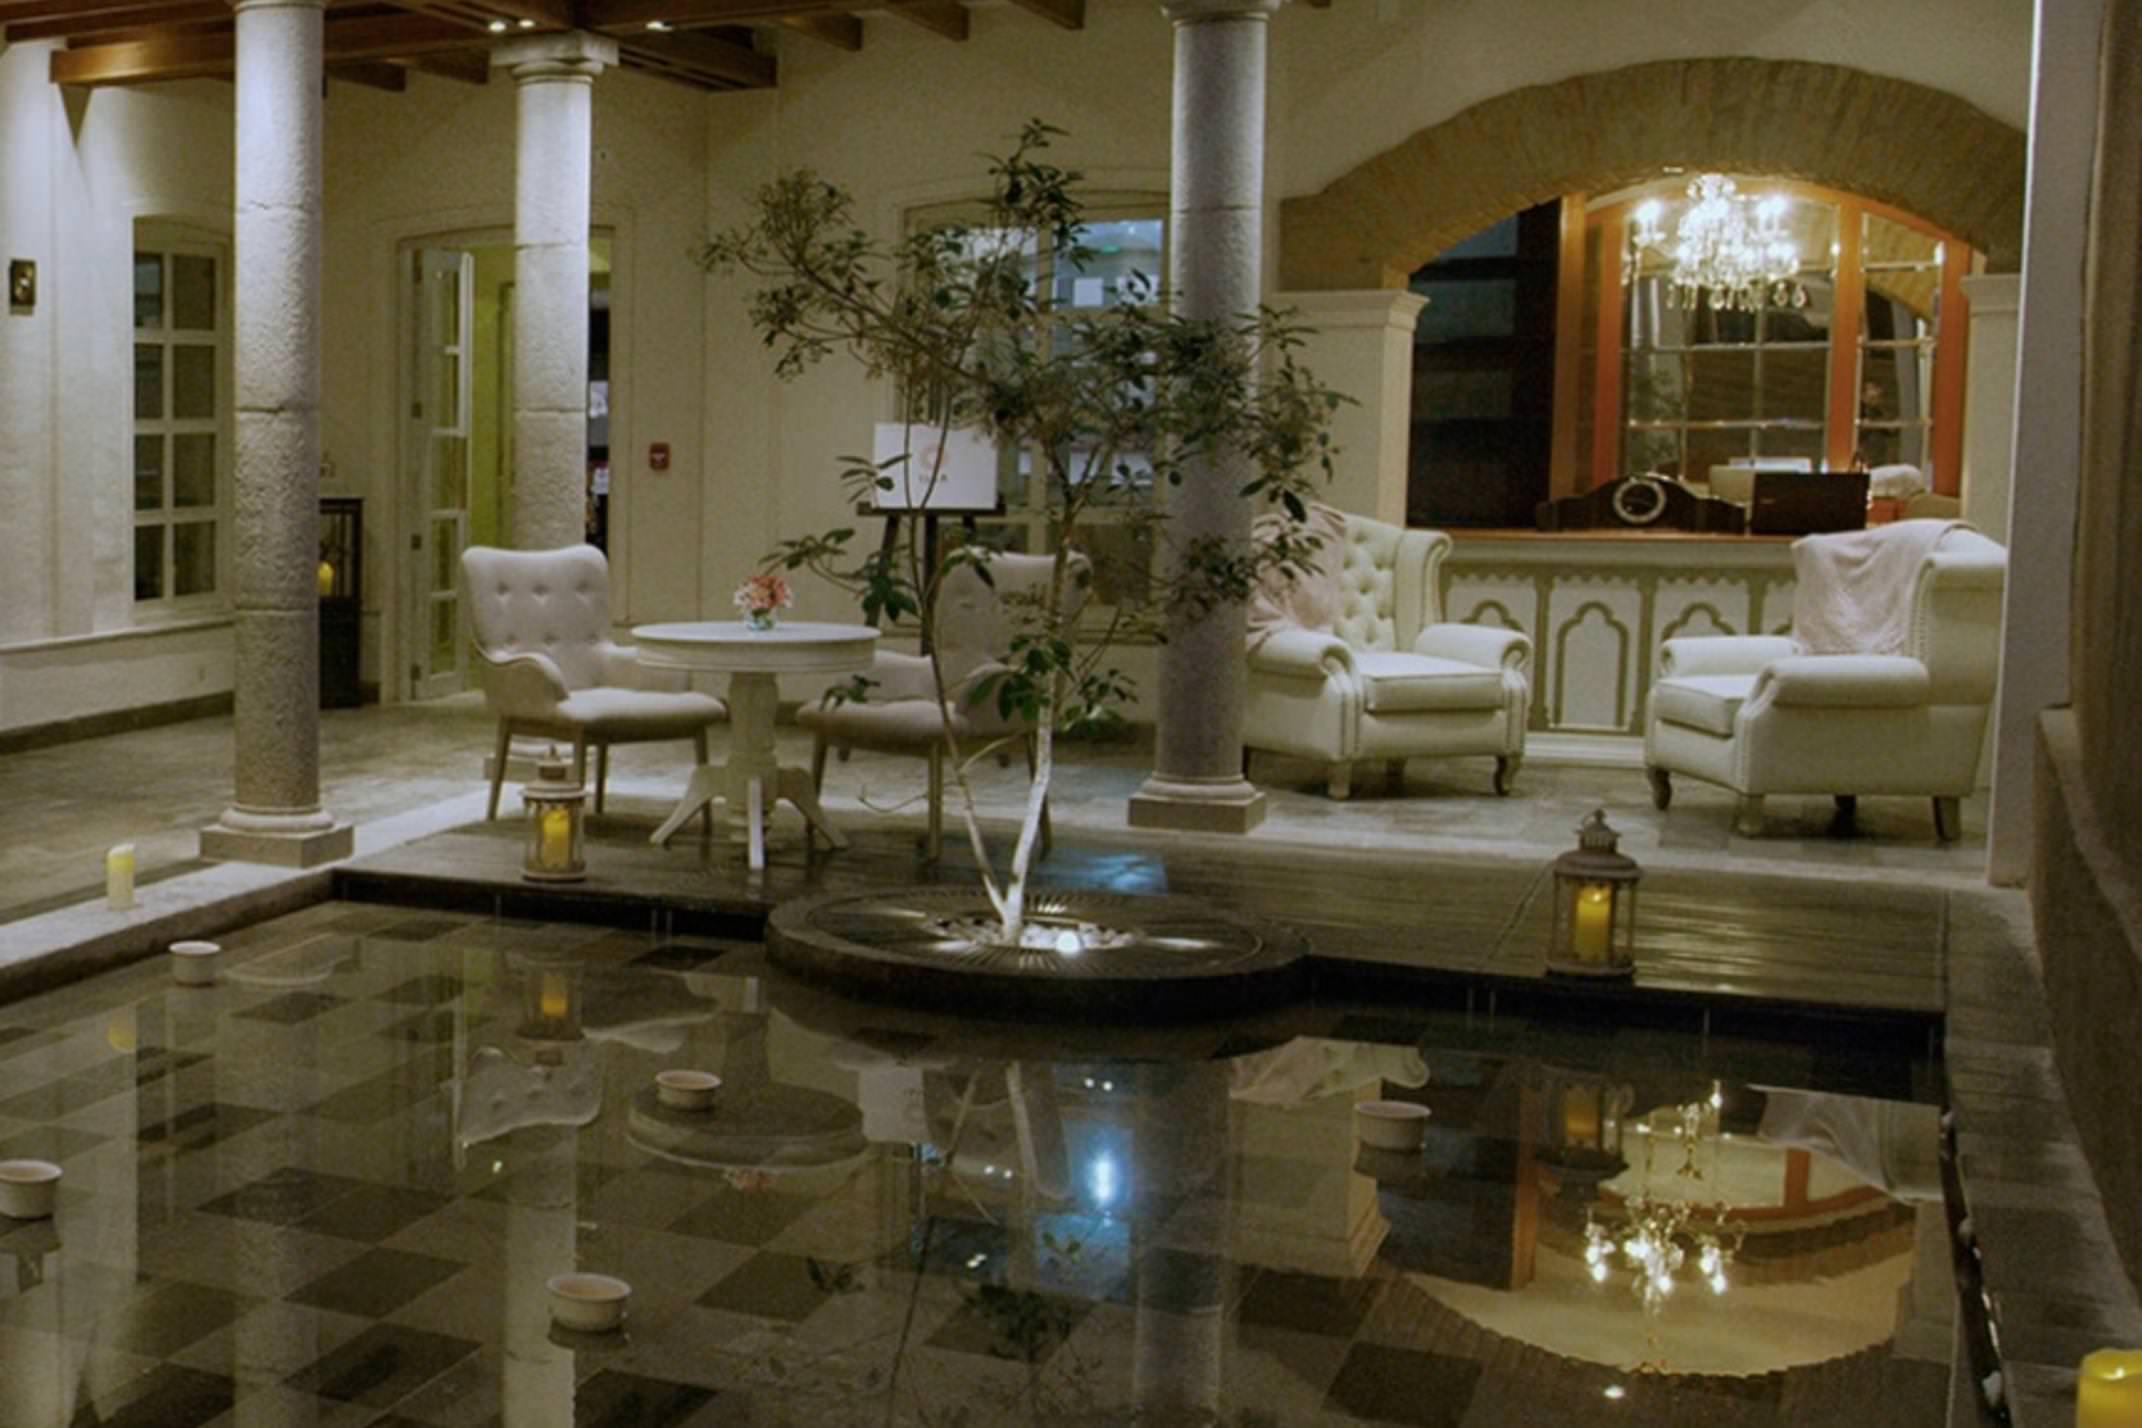 Ecuador quito illa experience hotel lobby area